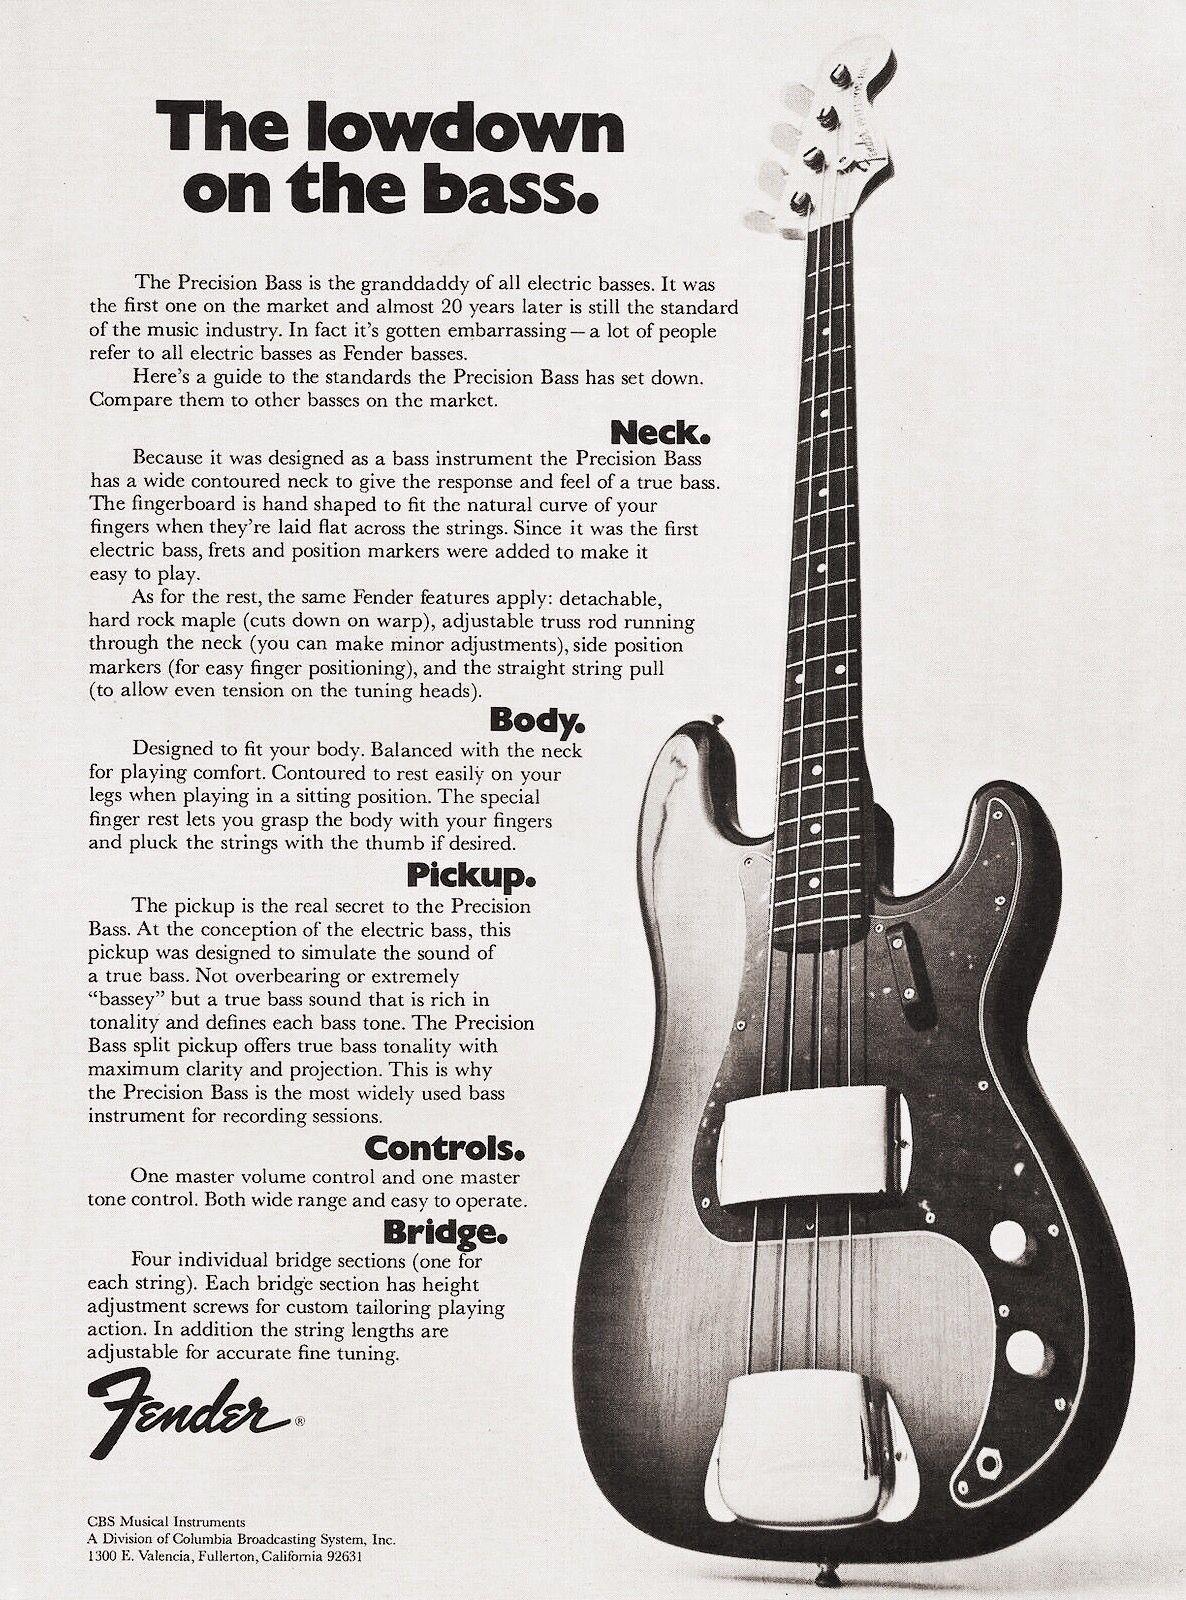 1960 39 s fender precision bass one sheet guitar music artifacts in 2019 bass fender. Black Bedroom Furniture Sets. Home Design Ideas